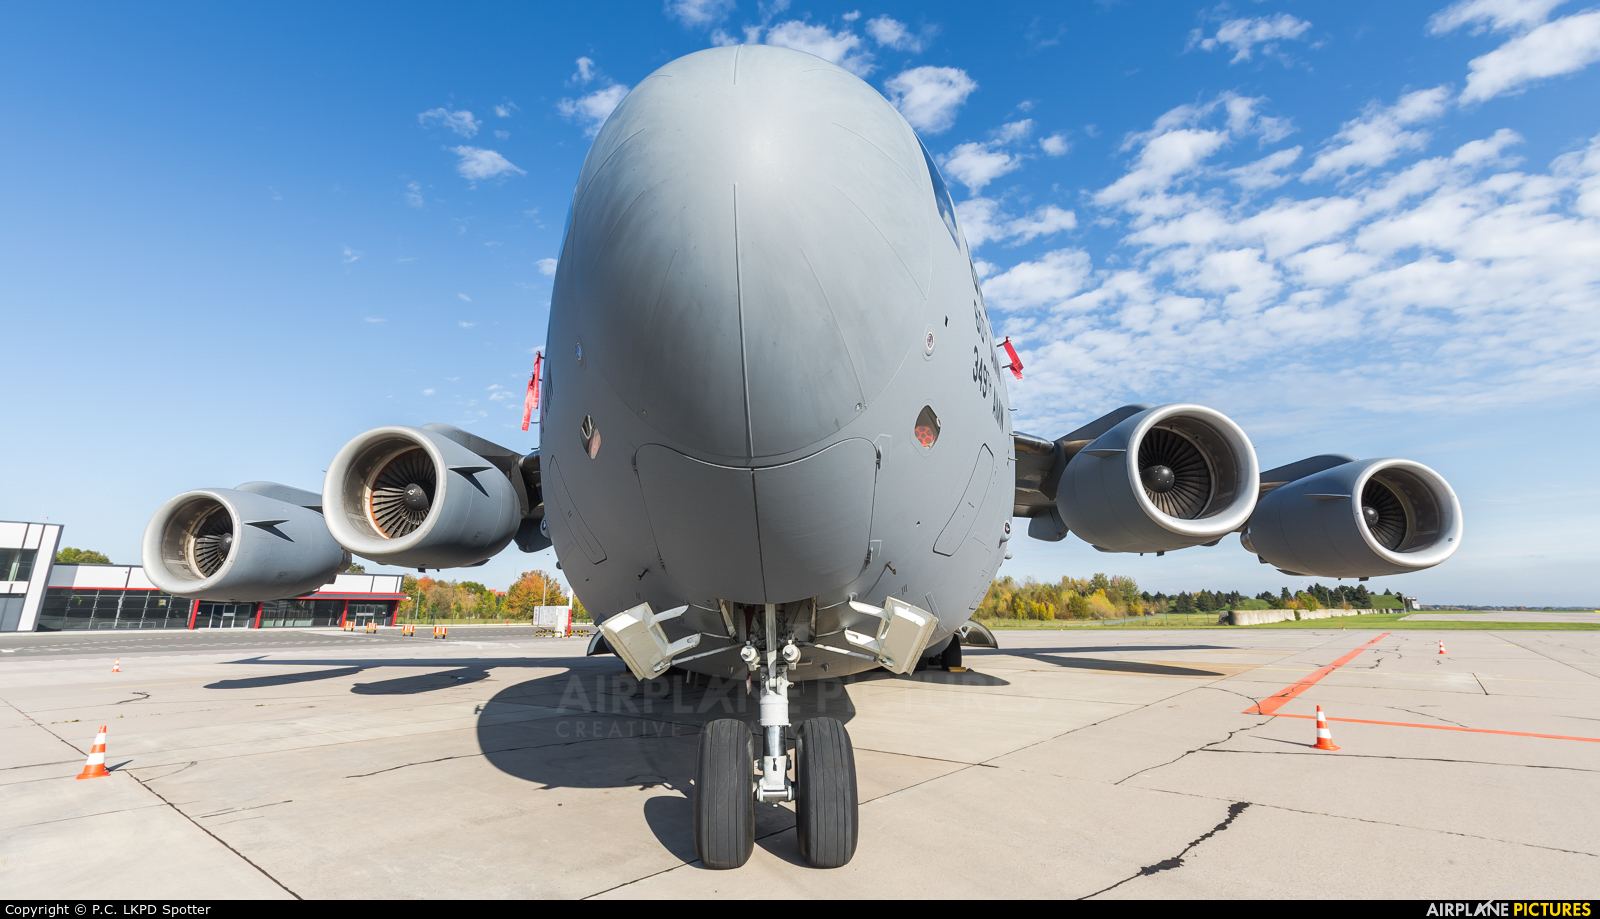 USA - Air Force 06-6162 aircraft at Pardubice